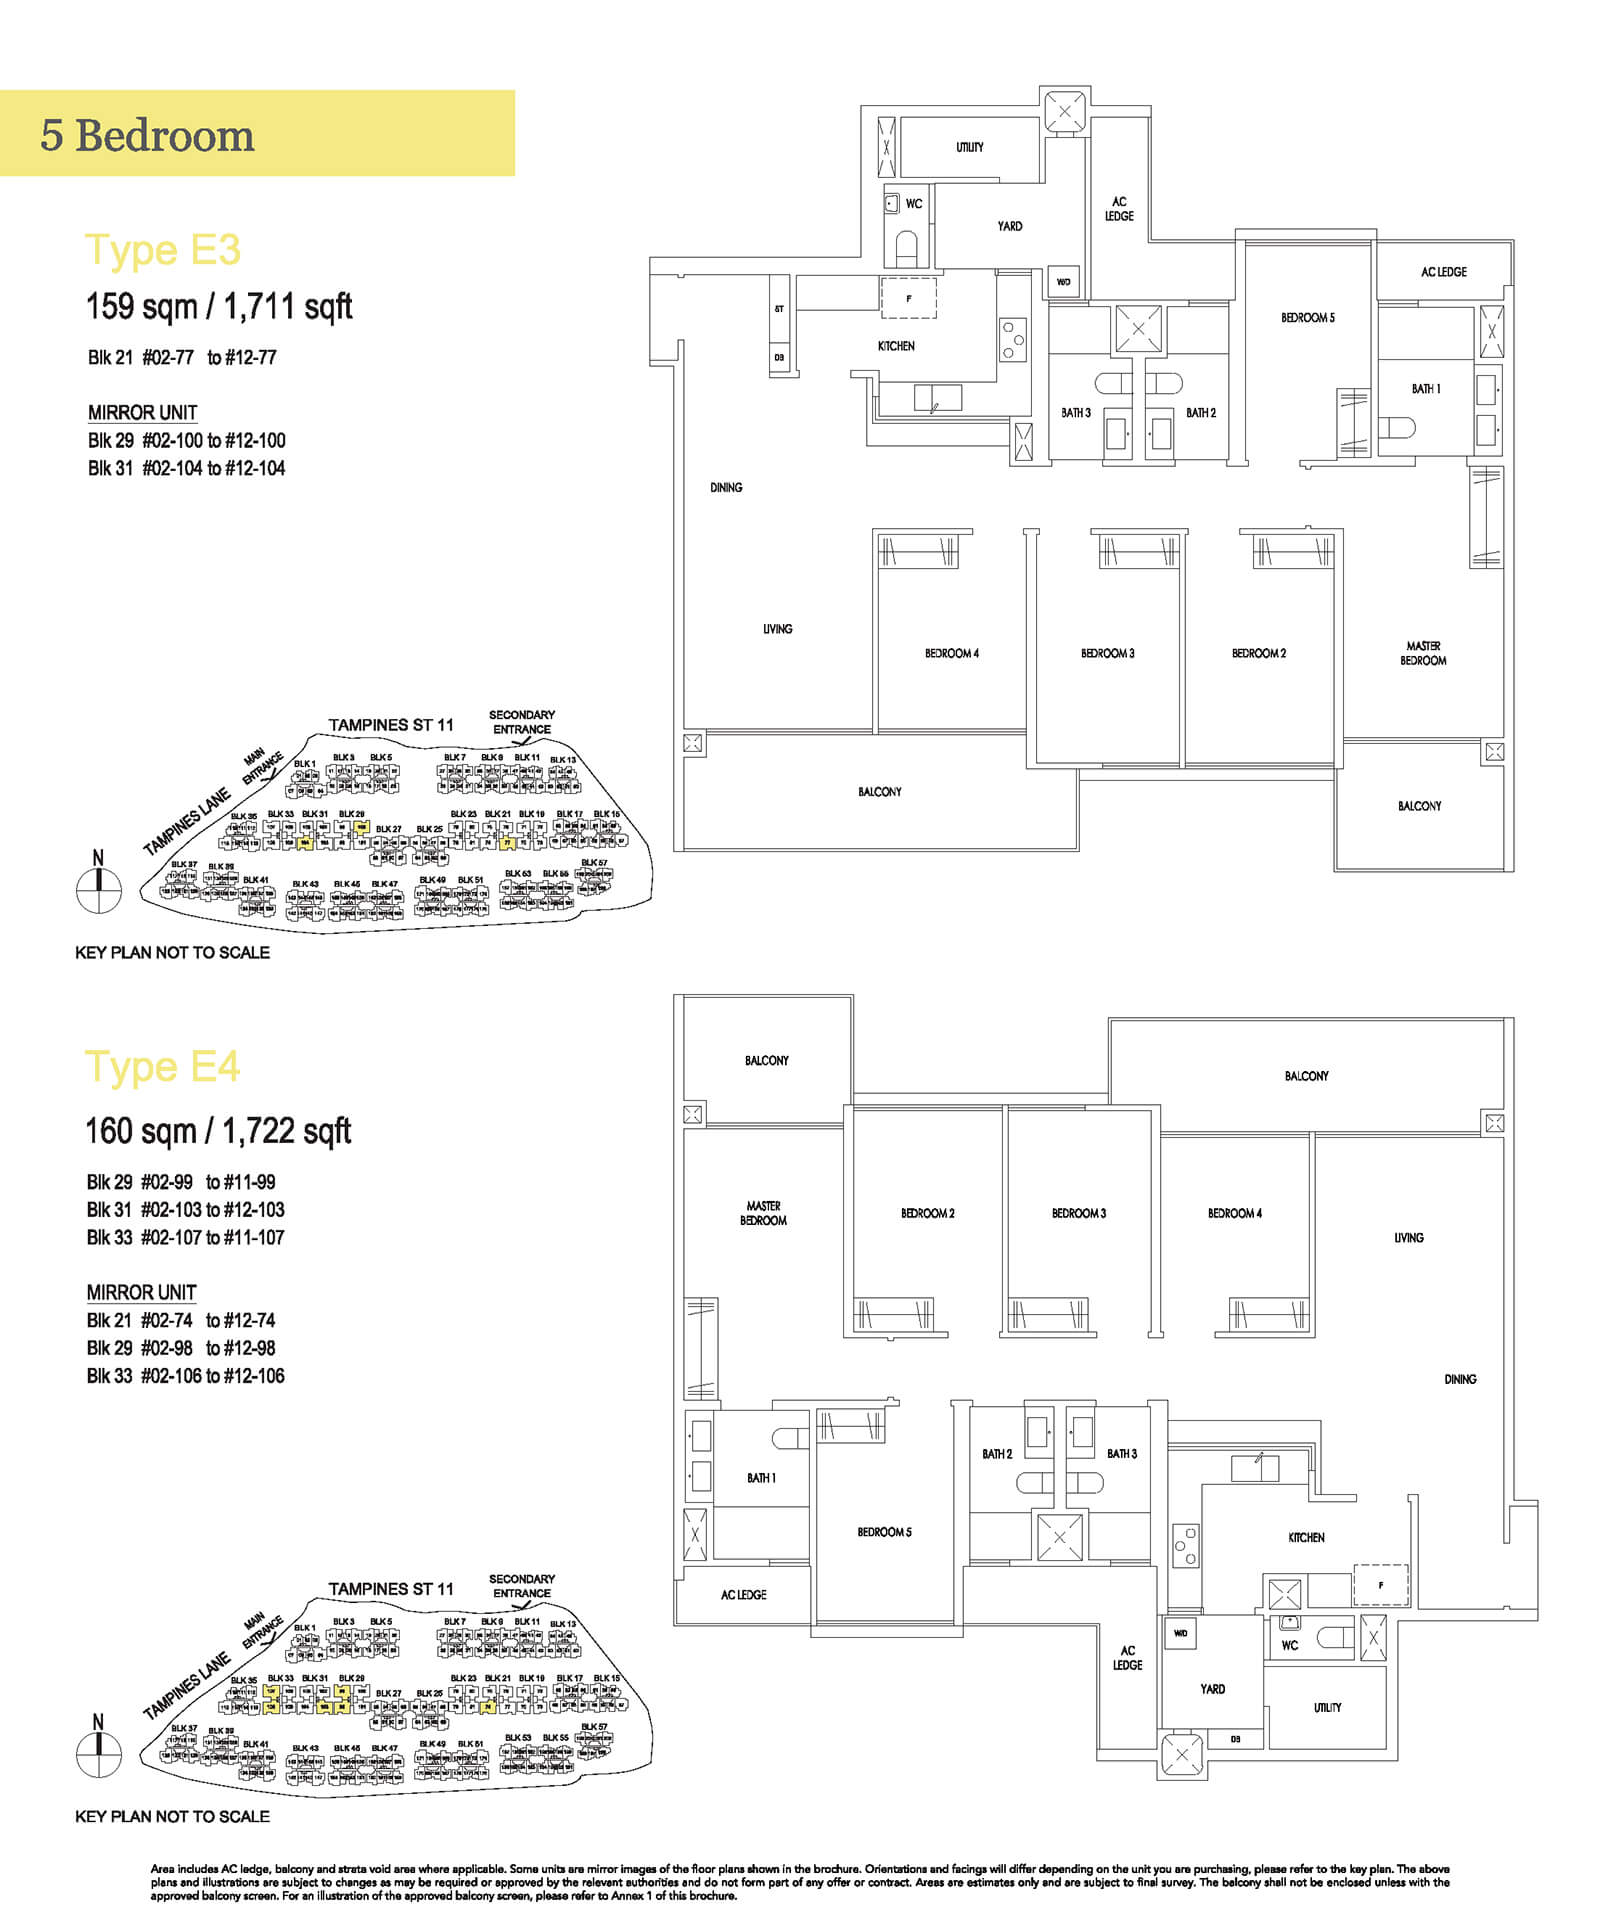 Treasure At Tampines Floor Plan 5-Bedroom E3 E4